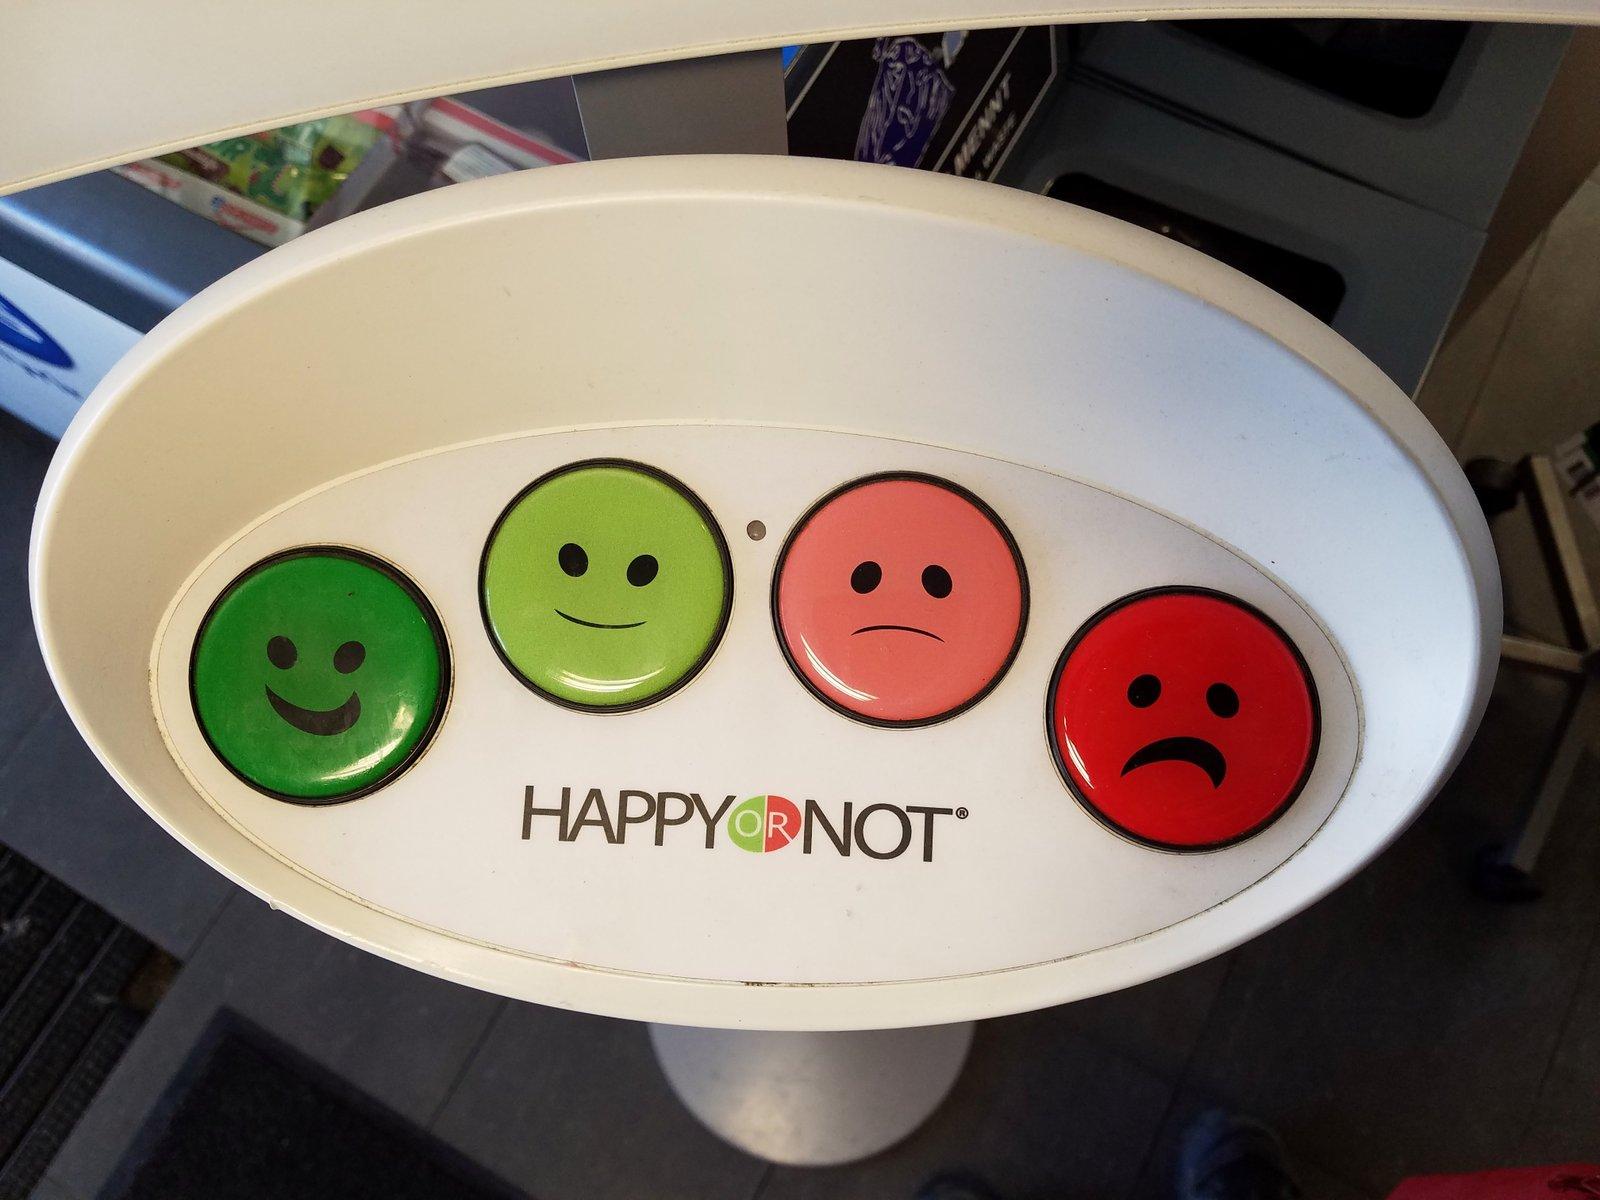 HappyOrNot Customer service